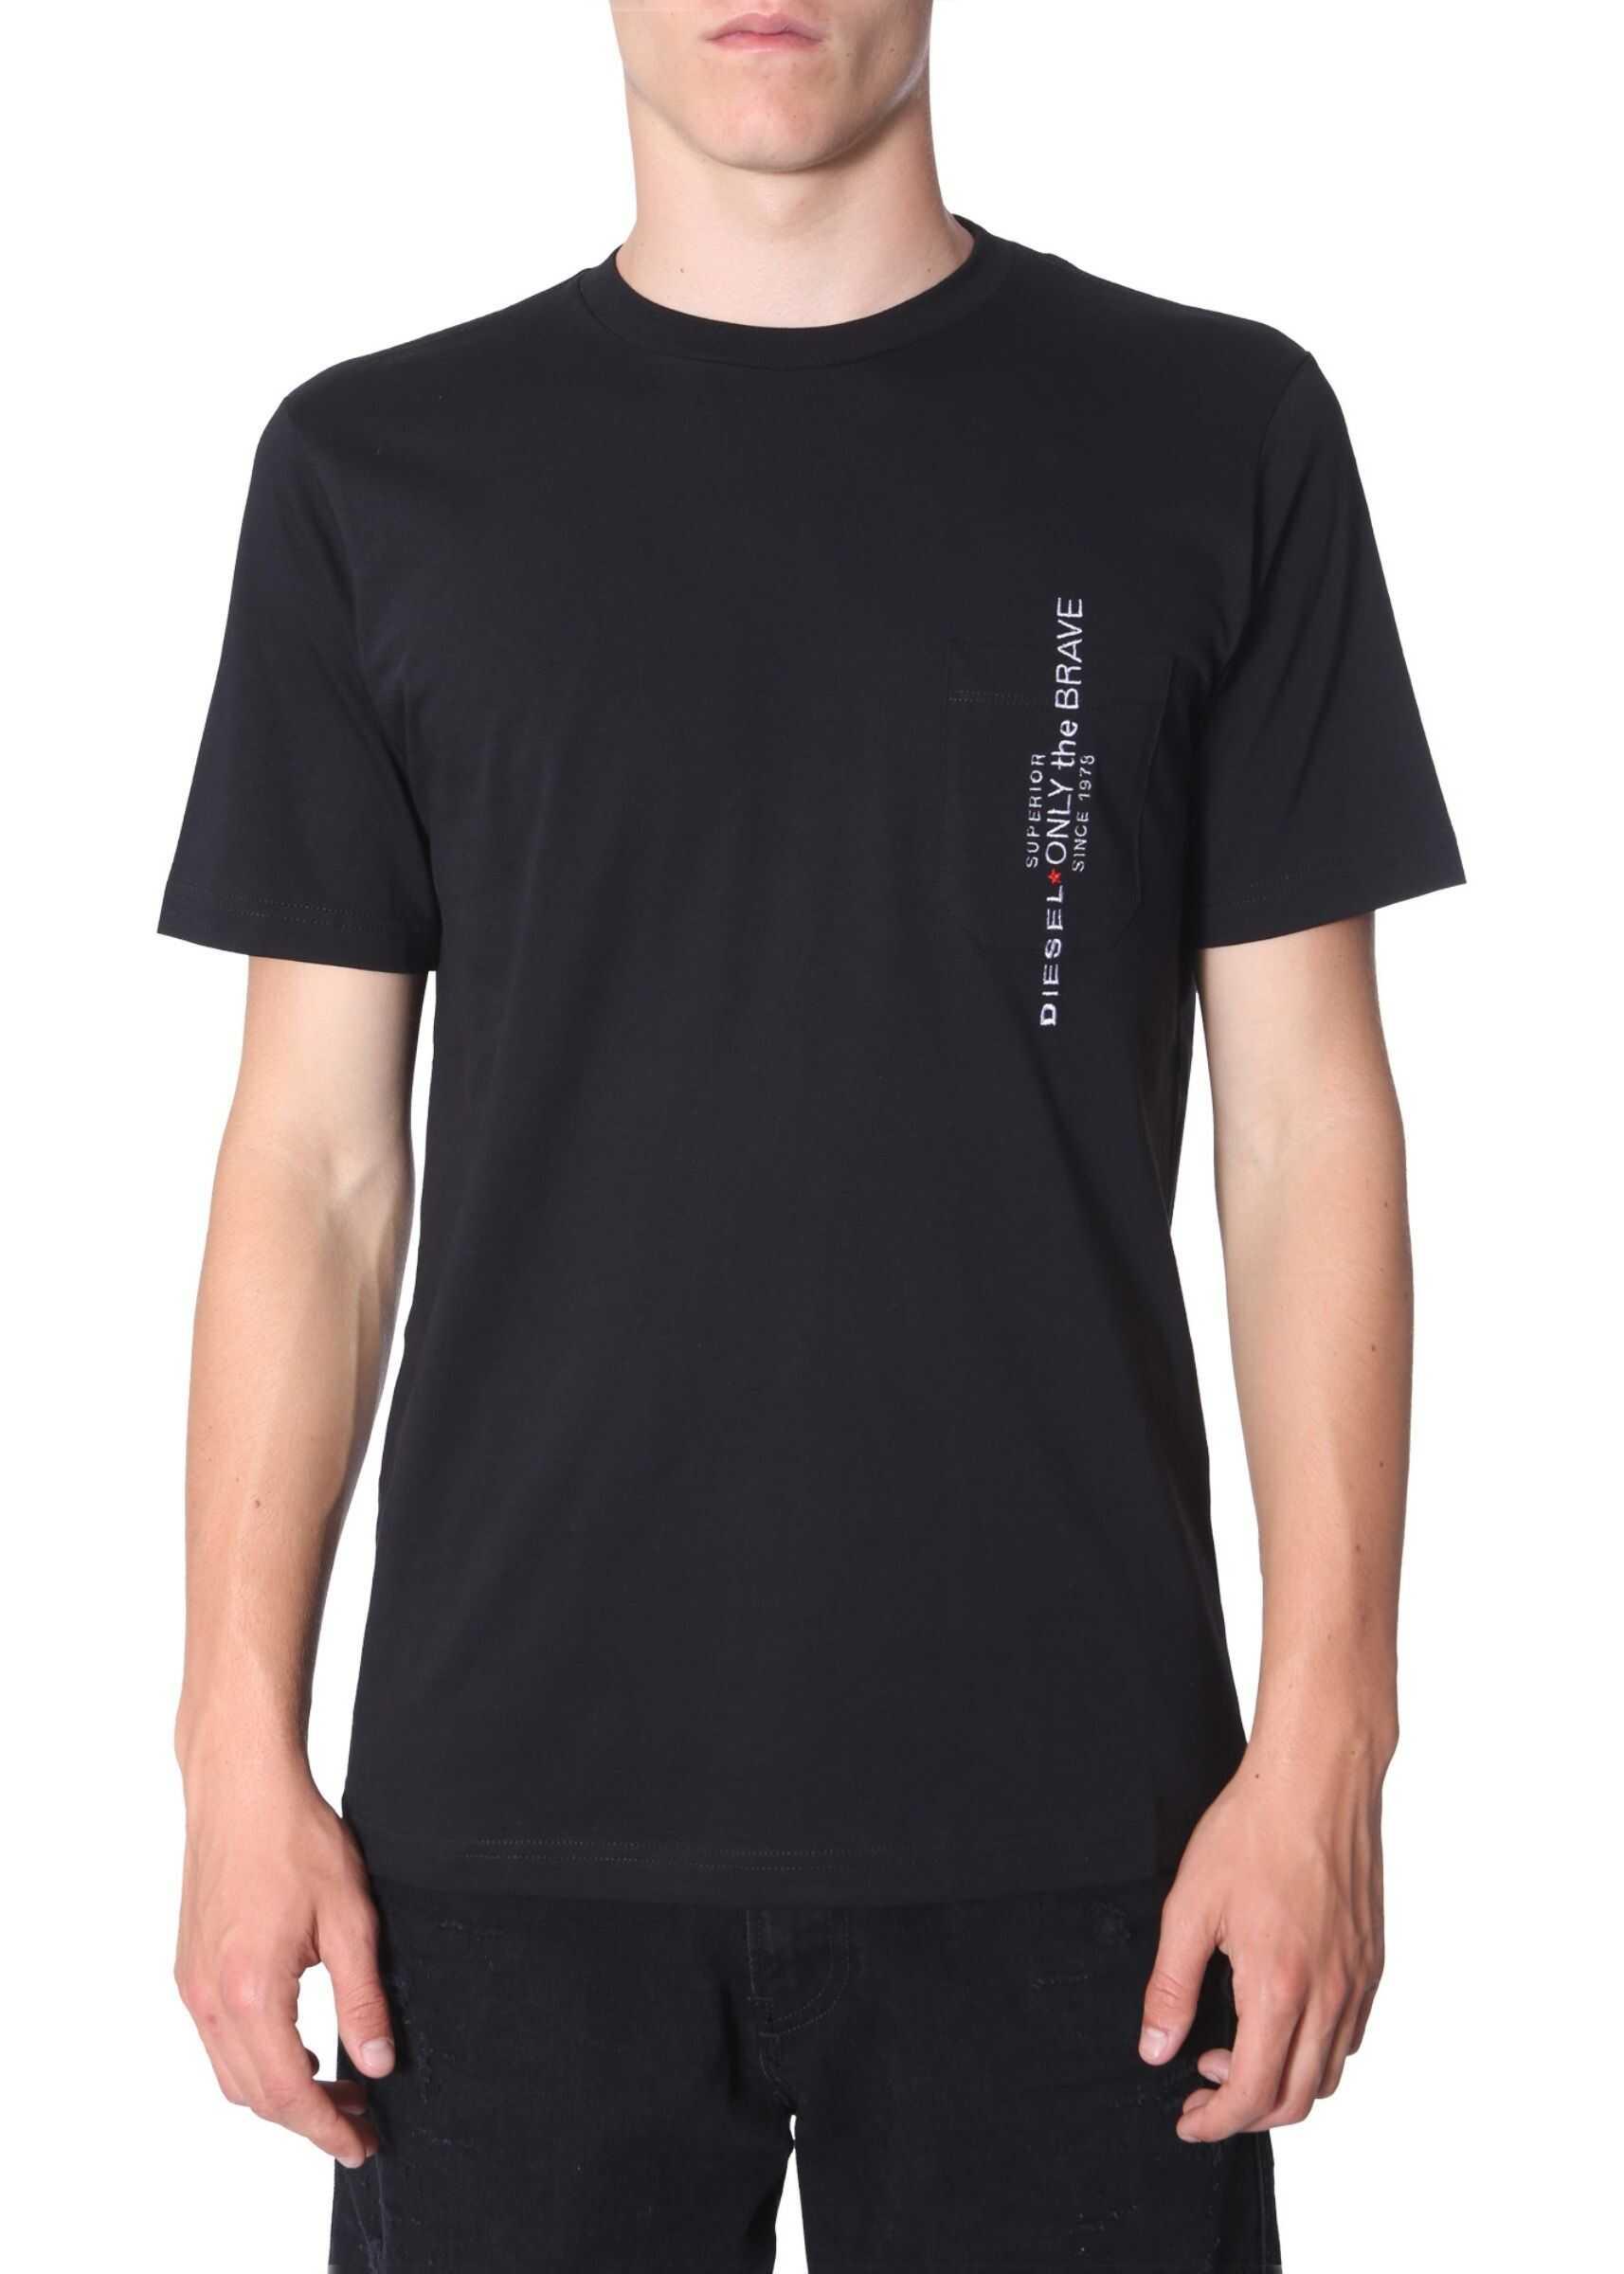 T-Shirt T-Just Pocket